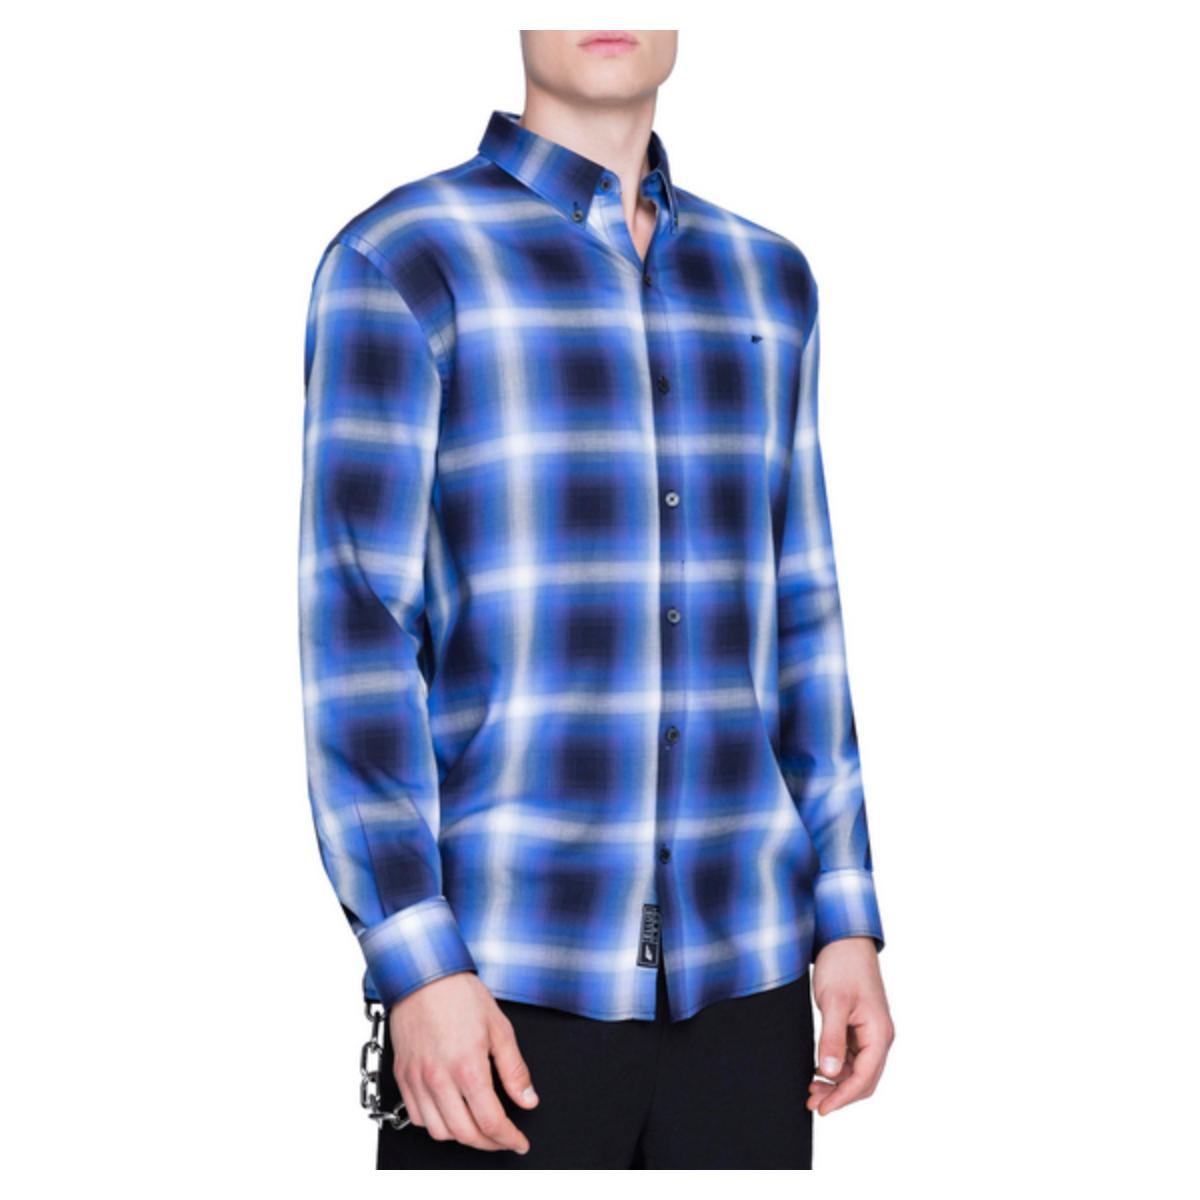 Camisa Masculina Ellus 51b7305 00 Azul/preto